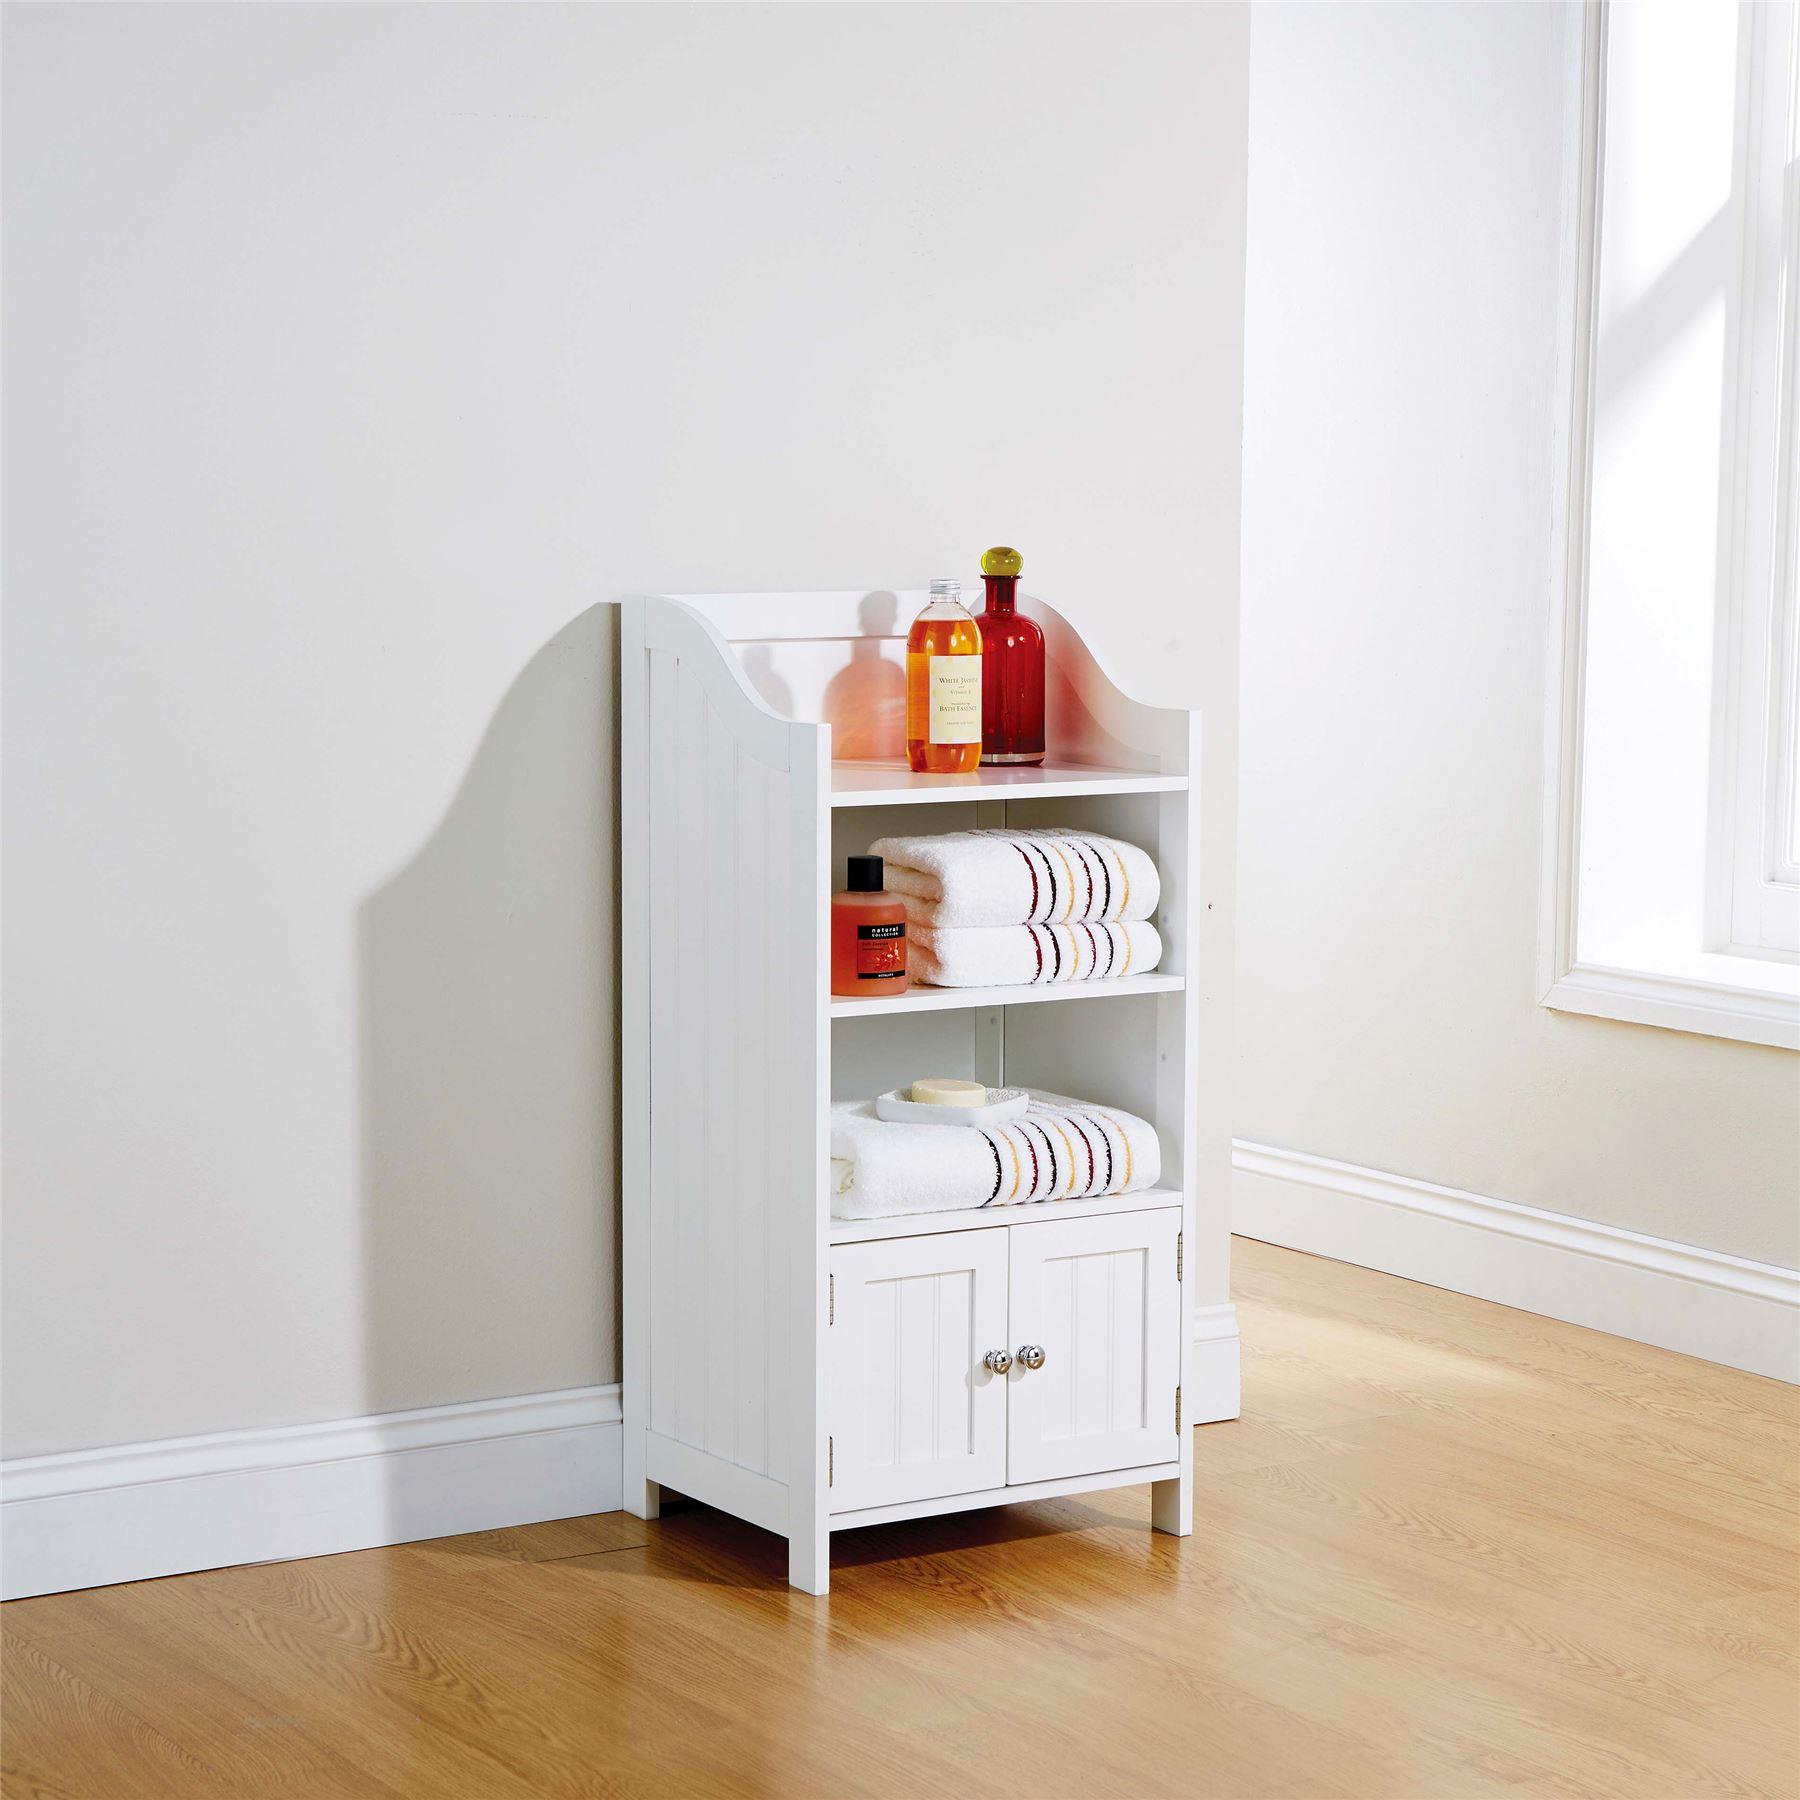 Bathroom tower shelf - Colonial Range Bathroom Furniture Cupboard Under Basin Cabinet